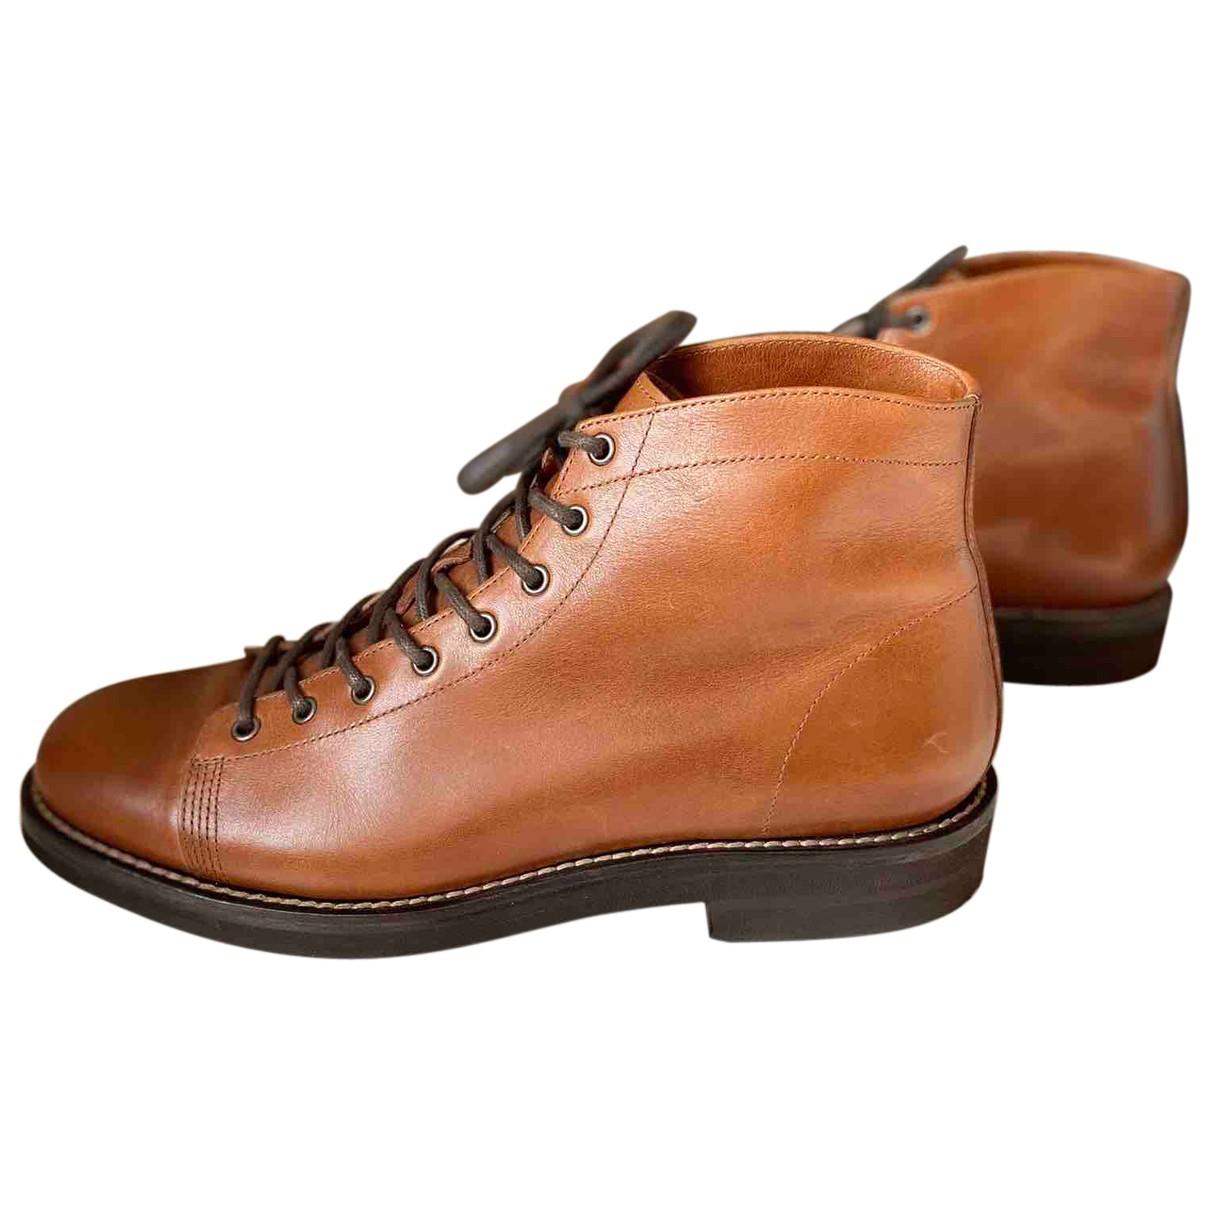 Brunello Cucinelli N Beige Leather Boots for Men 45 EU